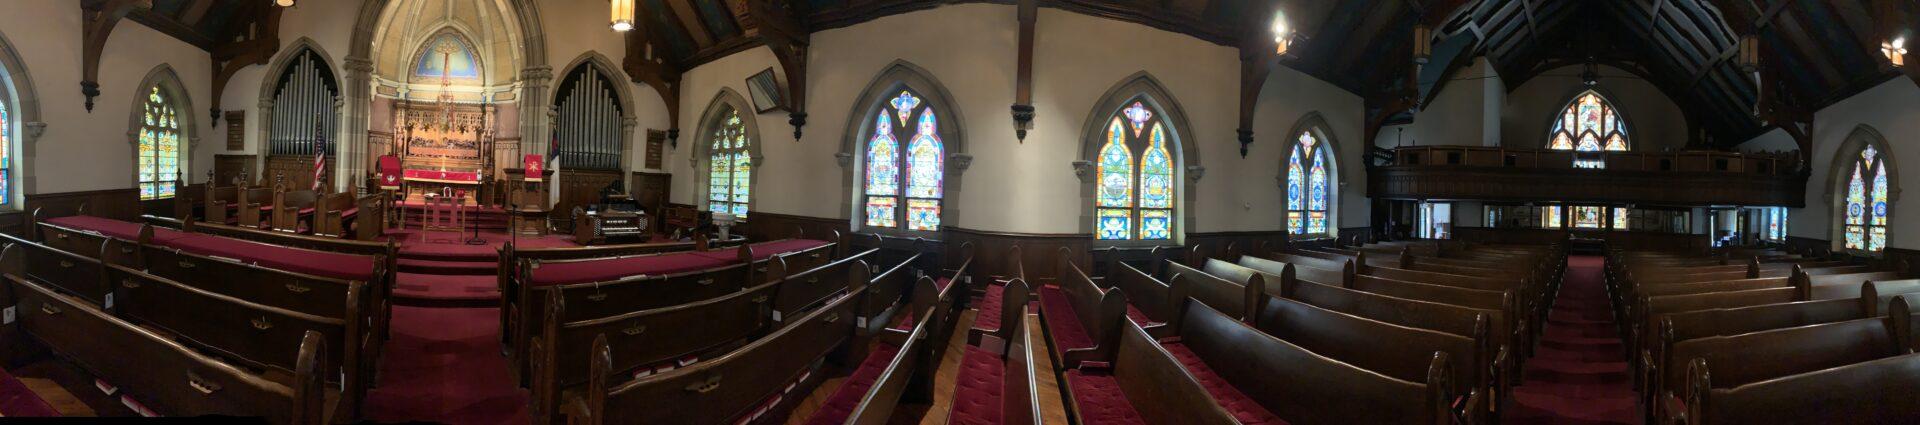 Calvary United Church of Christ